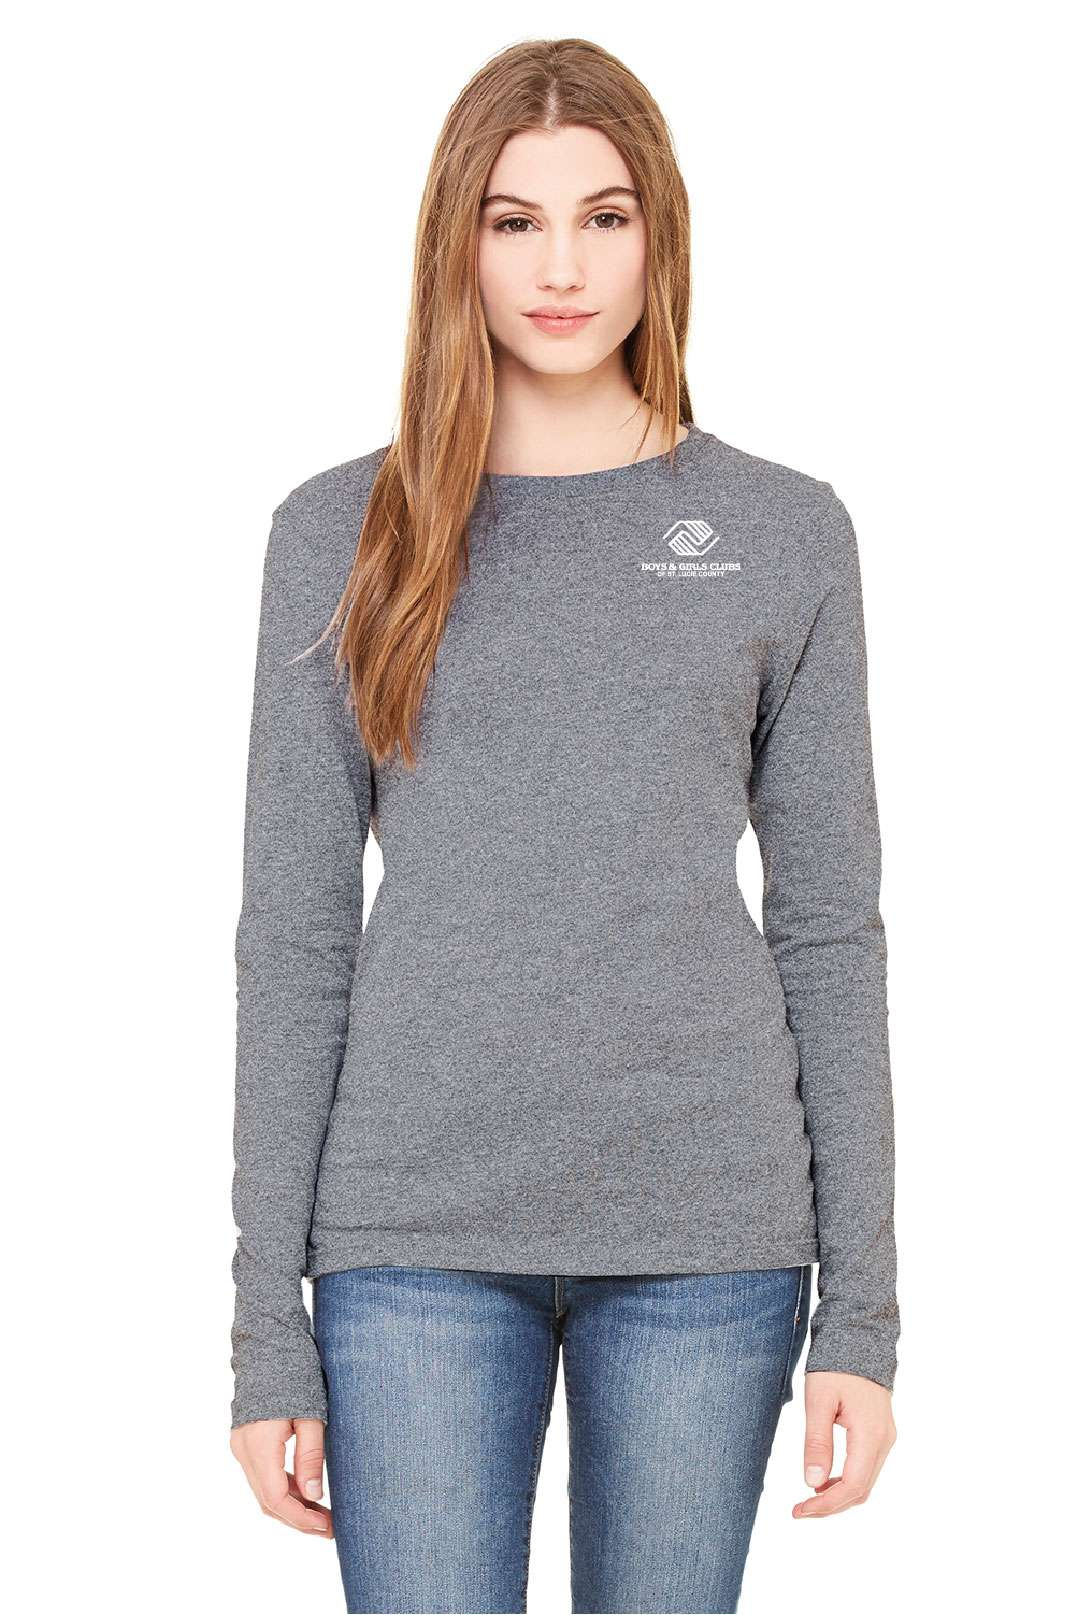 BGC-B6500 BELLA CANVAS Ladies' Jersey Long-Sleeve T-Shirt